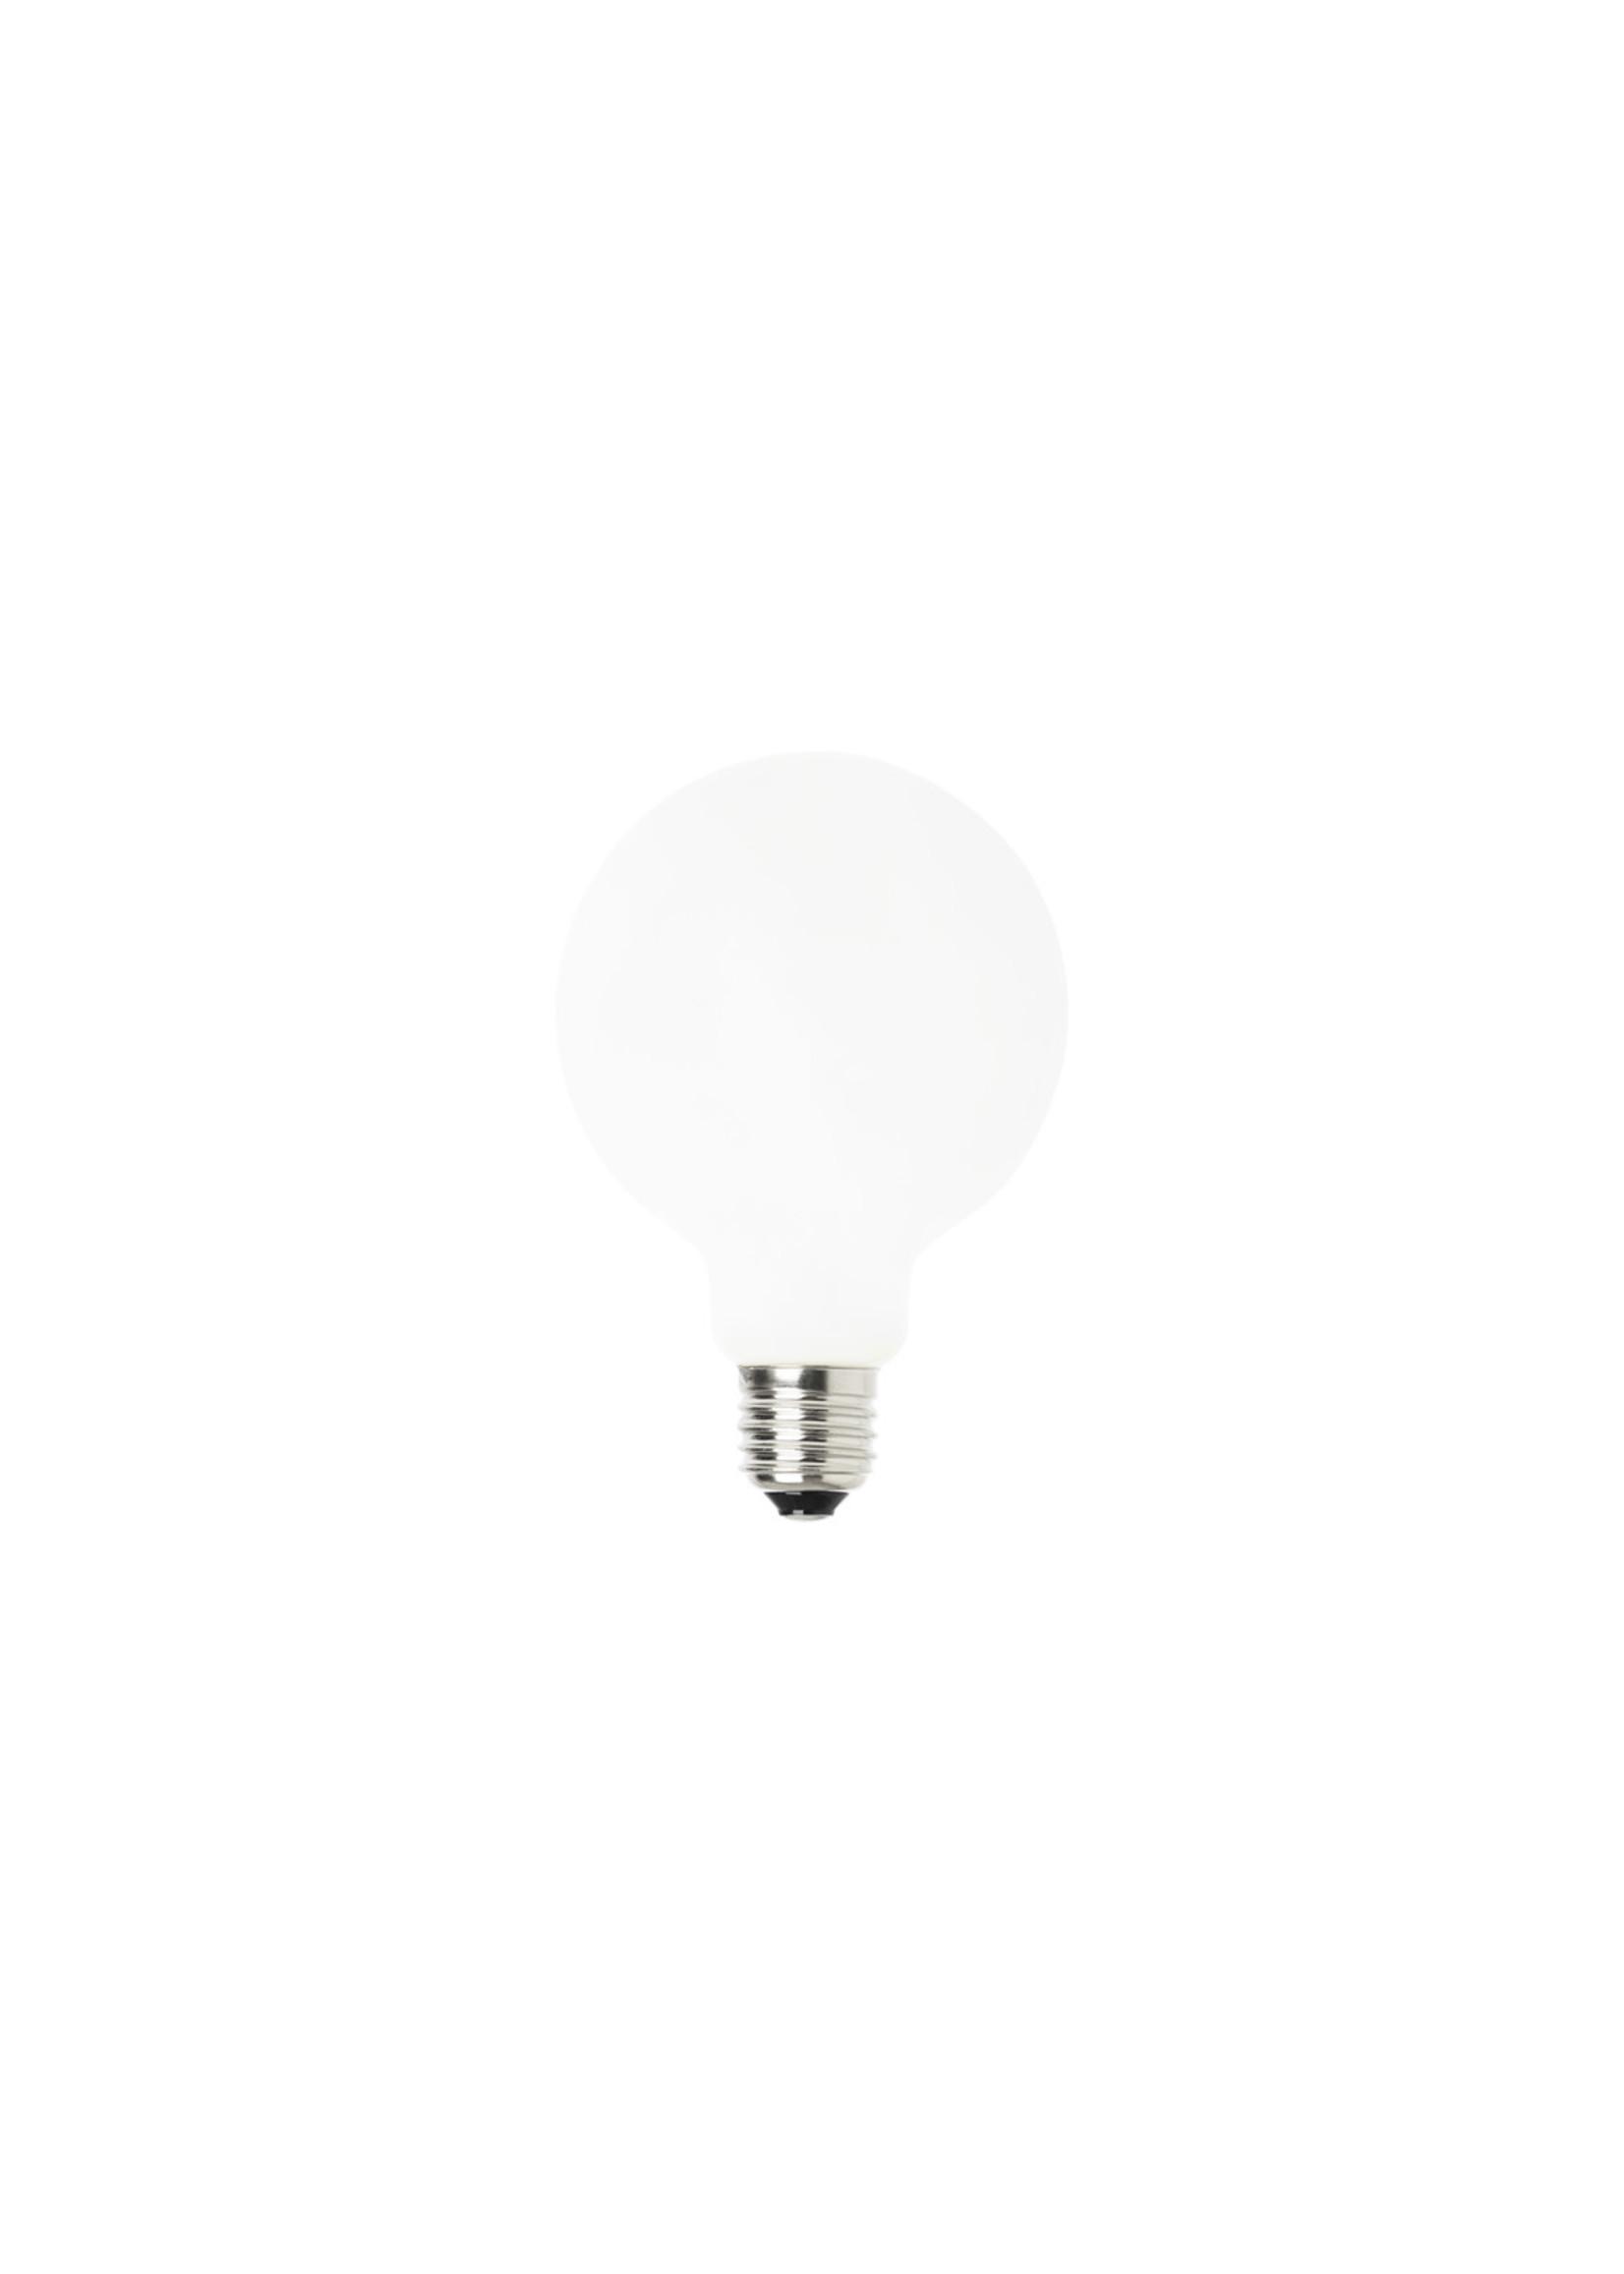 ferm LIVING ferm LIVING Lighting - Opal LED 4W - Small